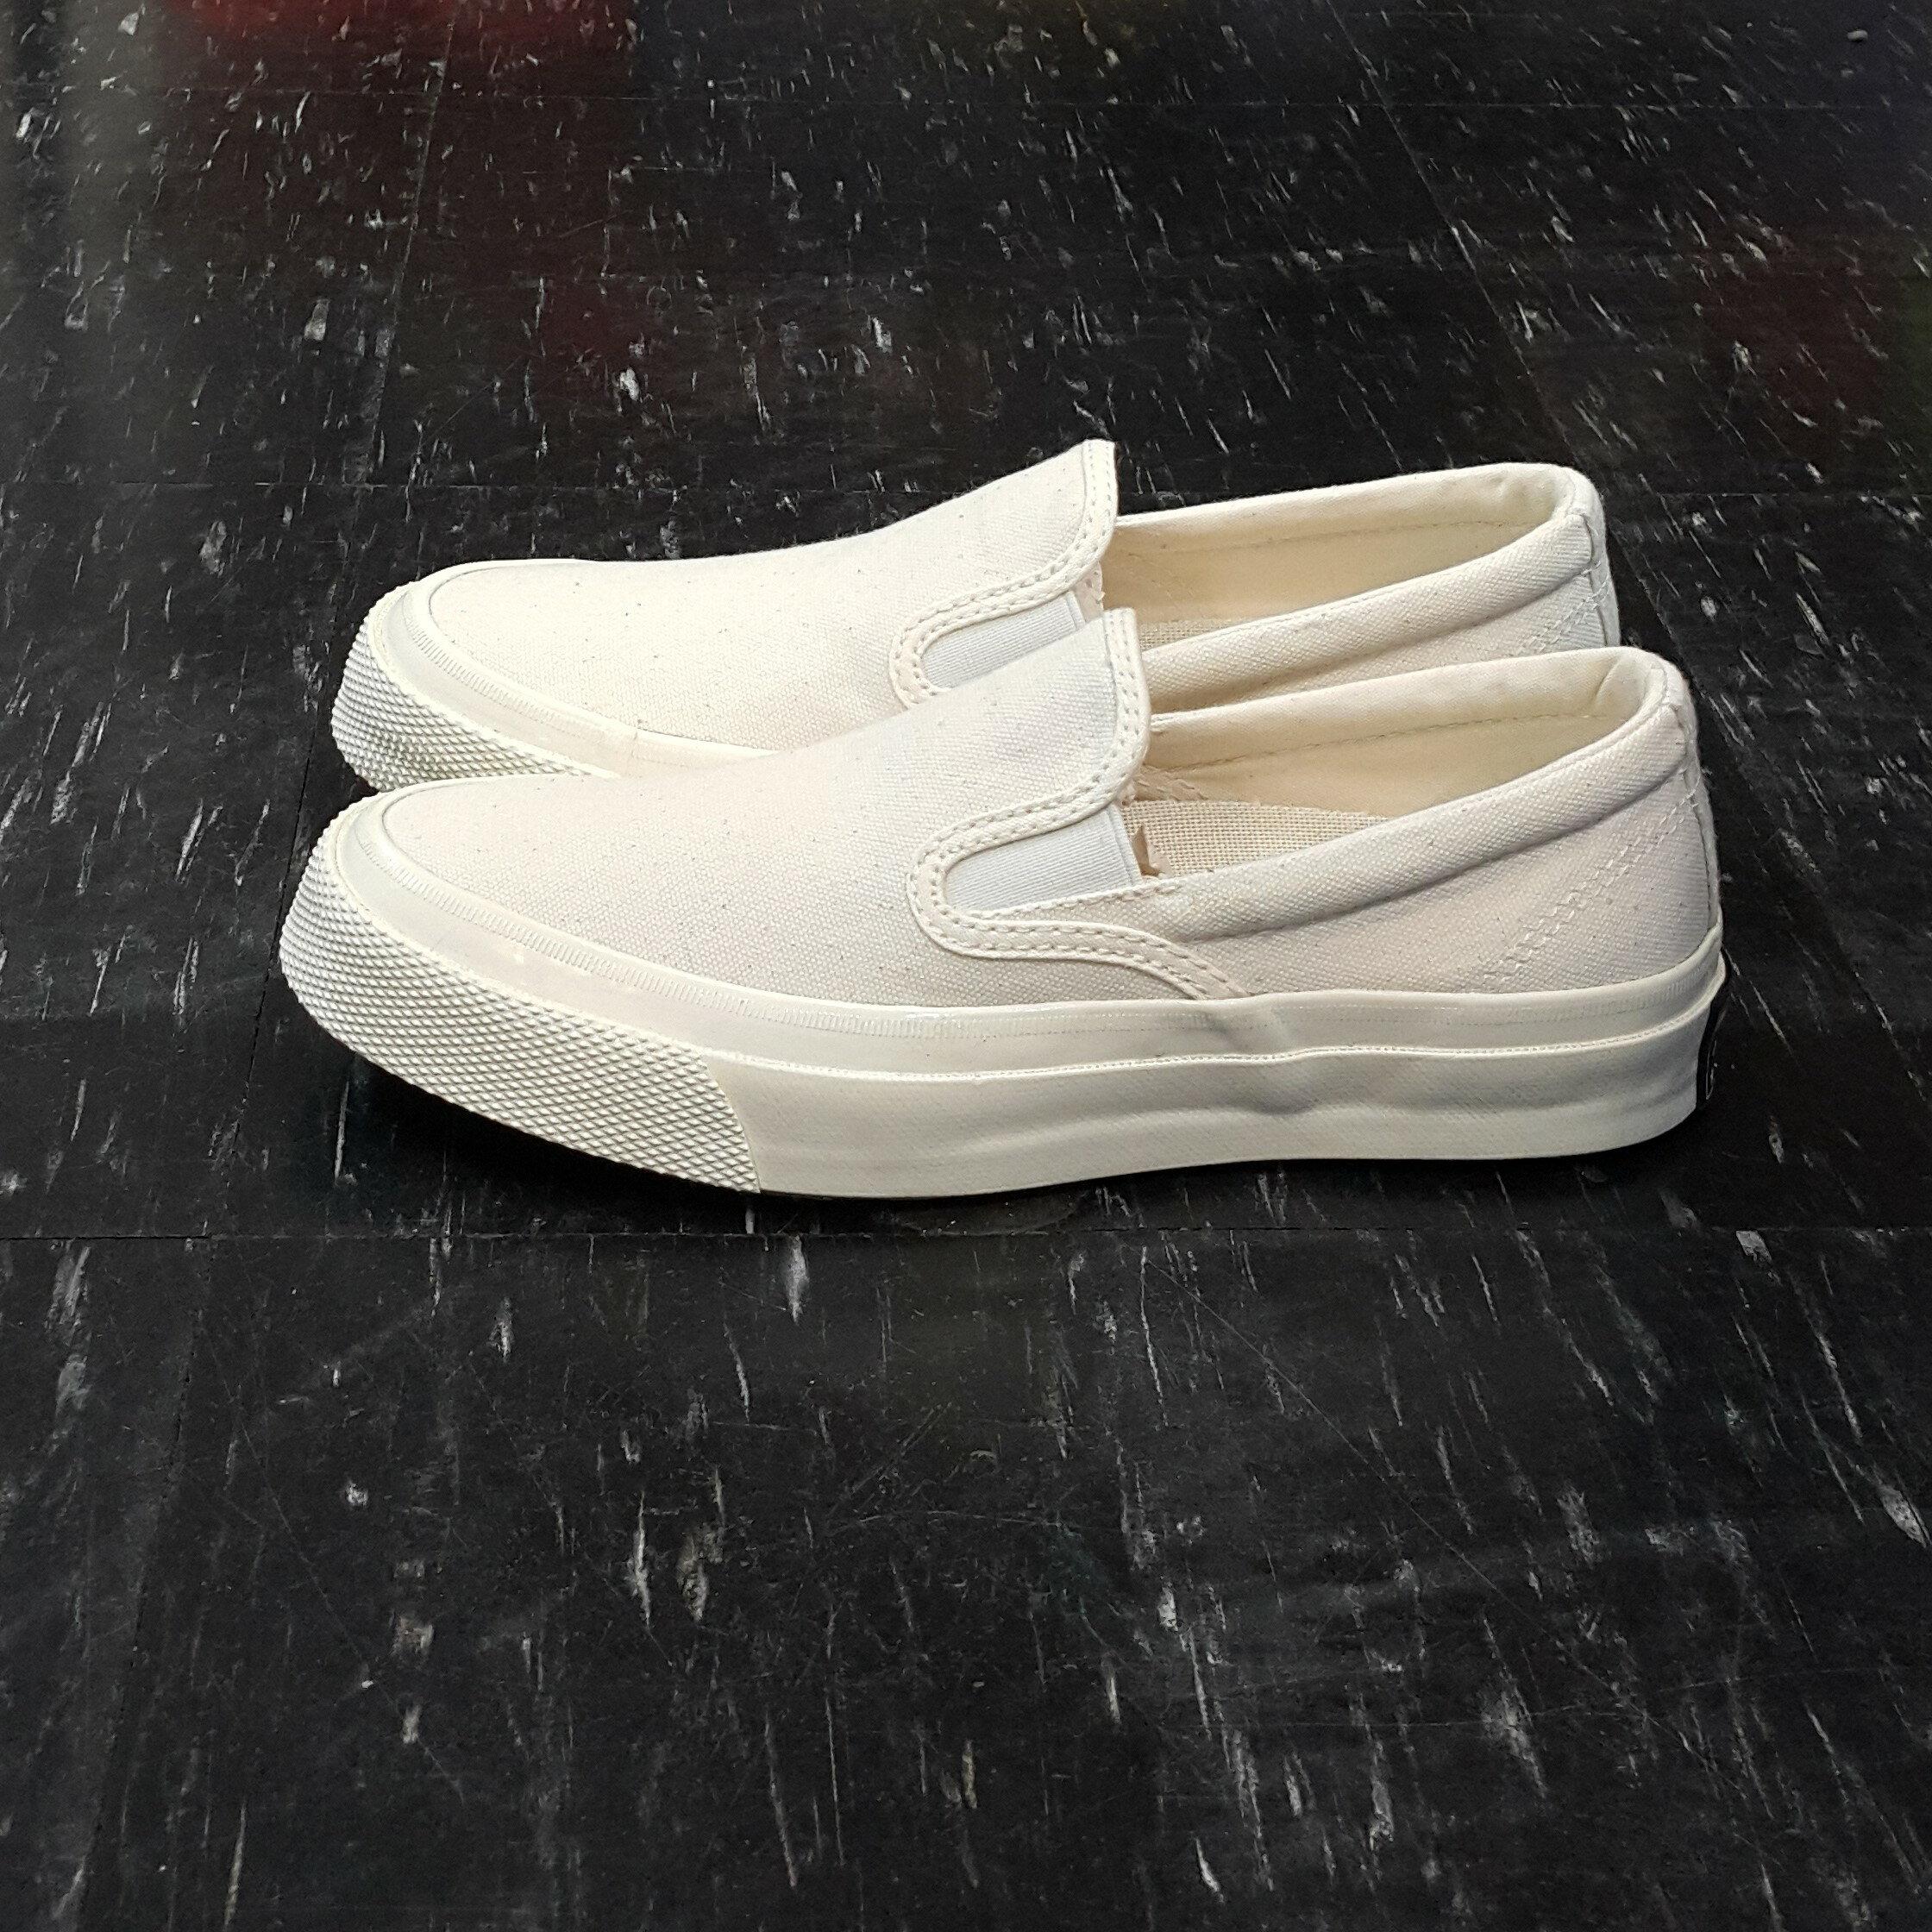 <br/><br/>  Converse Deck Star 67 1970s 懶人鞋 復刻 三星標 米白色 帆布 低筒 150856C【12/1-31 單筆滿2000結帳輸入序號 XmasGift-outdoor 再折↘250 | 單筆滿1000結帳輸入序號 XmasGift-100 再折↘100】<br/><br/>